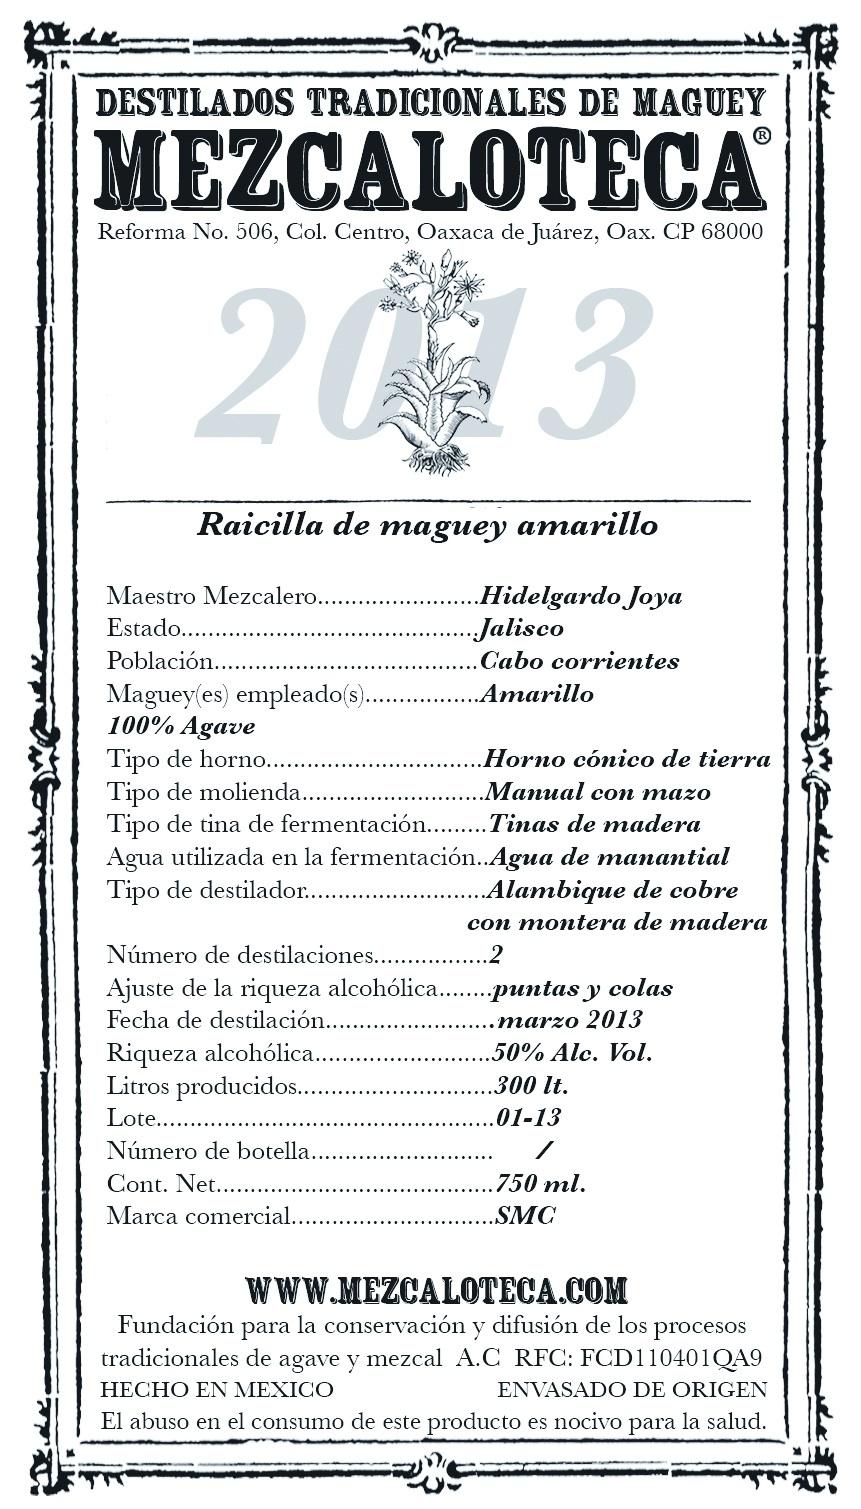 jalisco.raicilla.HJ.amarillo.750.2013[1]_1 web.jpg